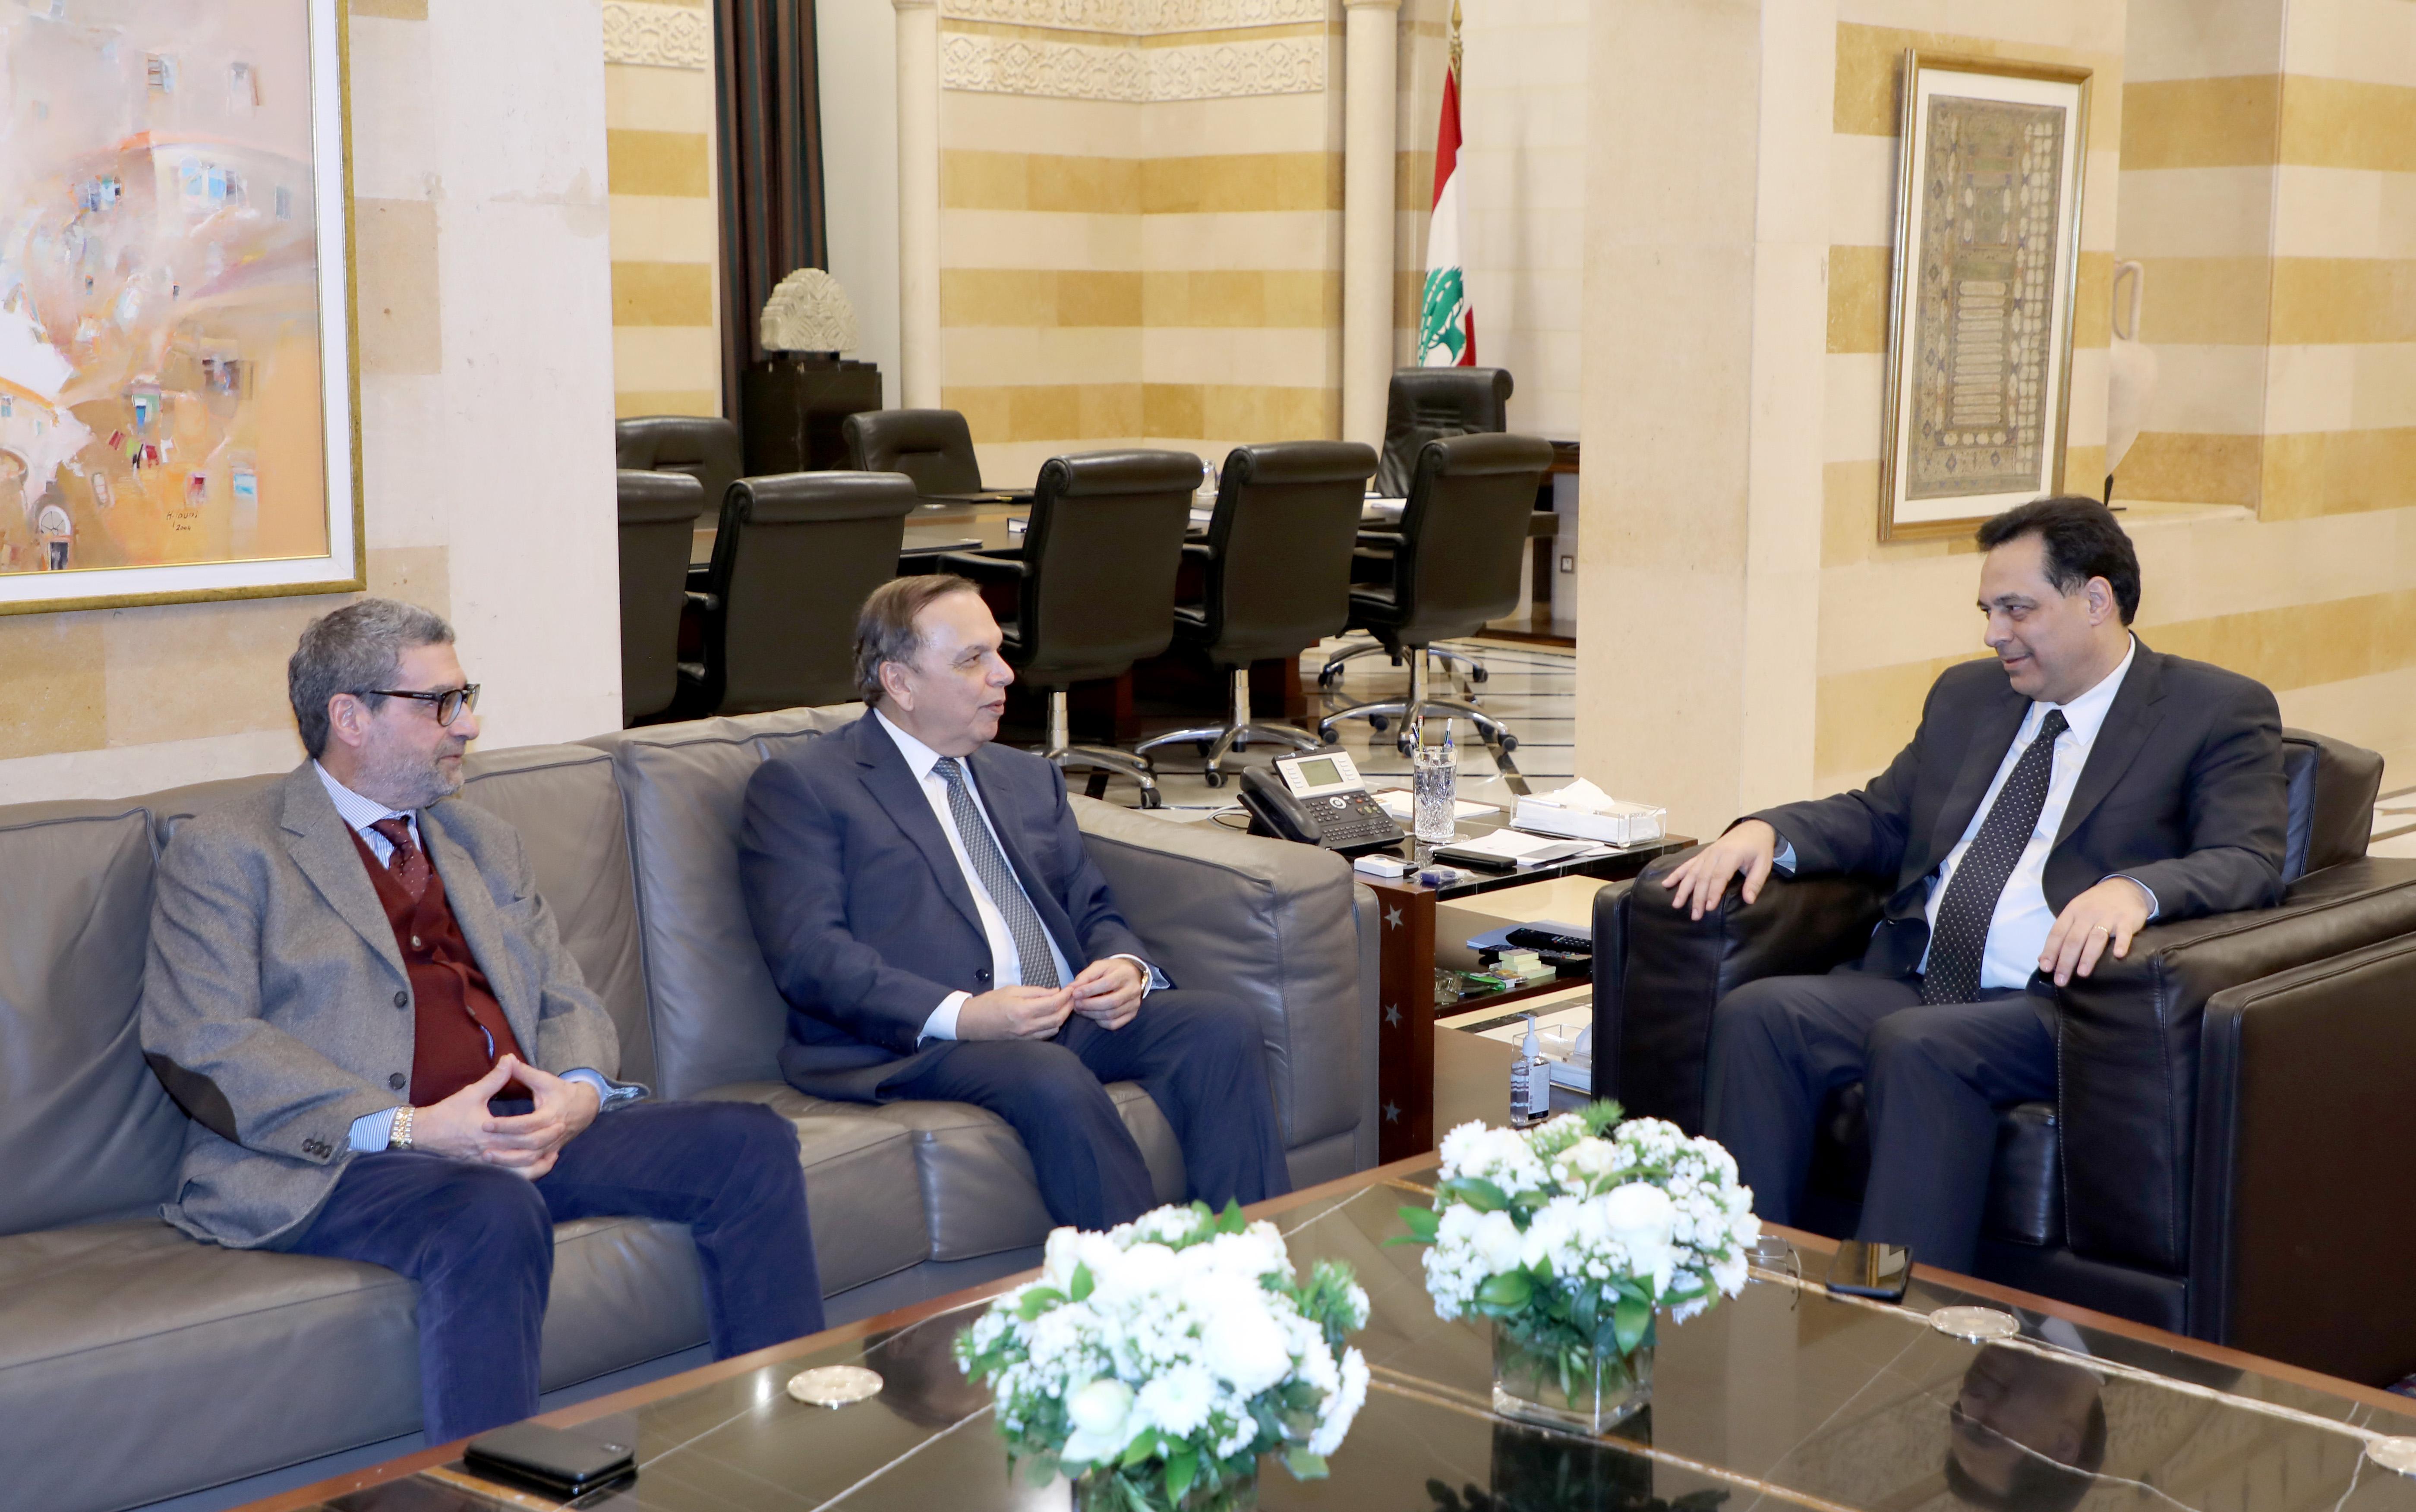 Pr Minister Hassan Diab meets Mr Maroun Helo